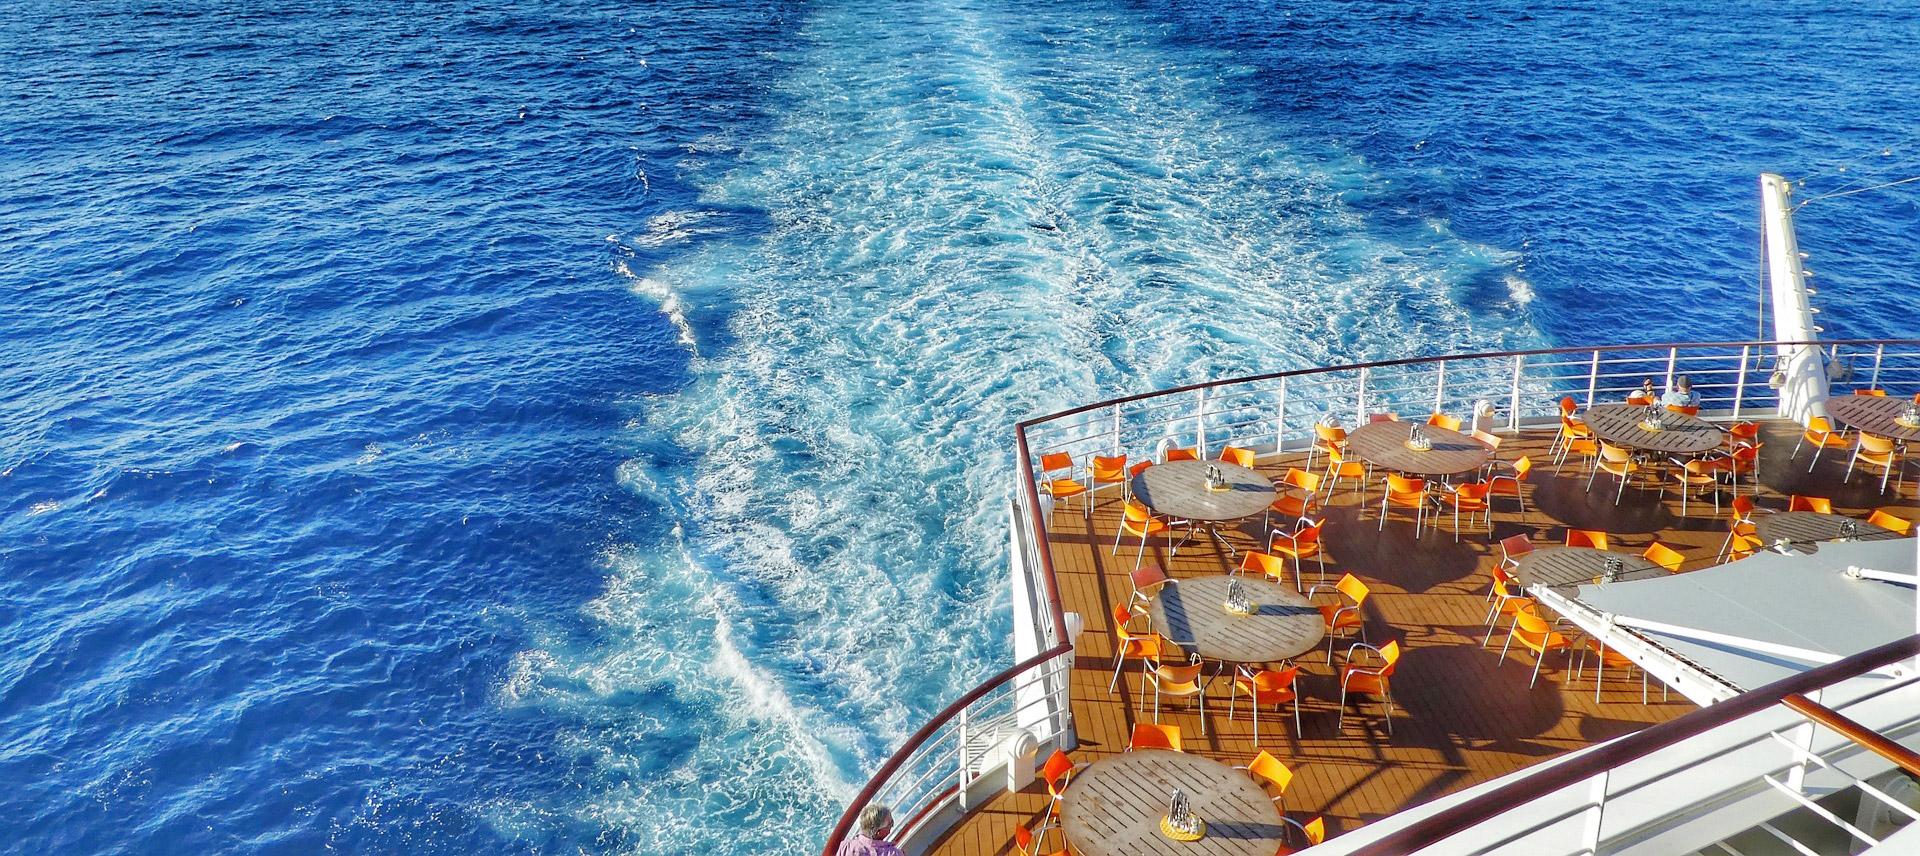 Shipmanagement companies target passenger ships